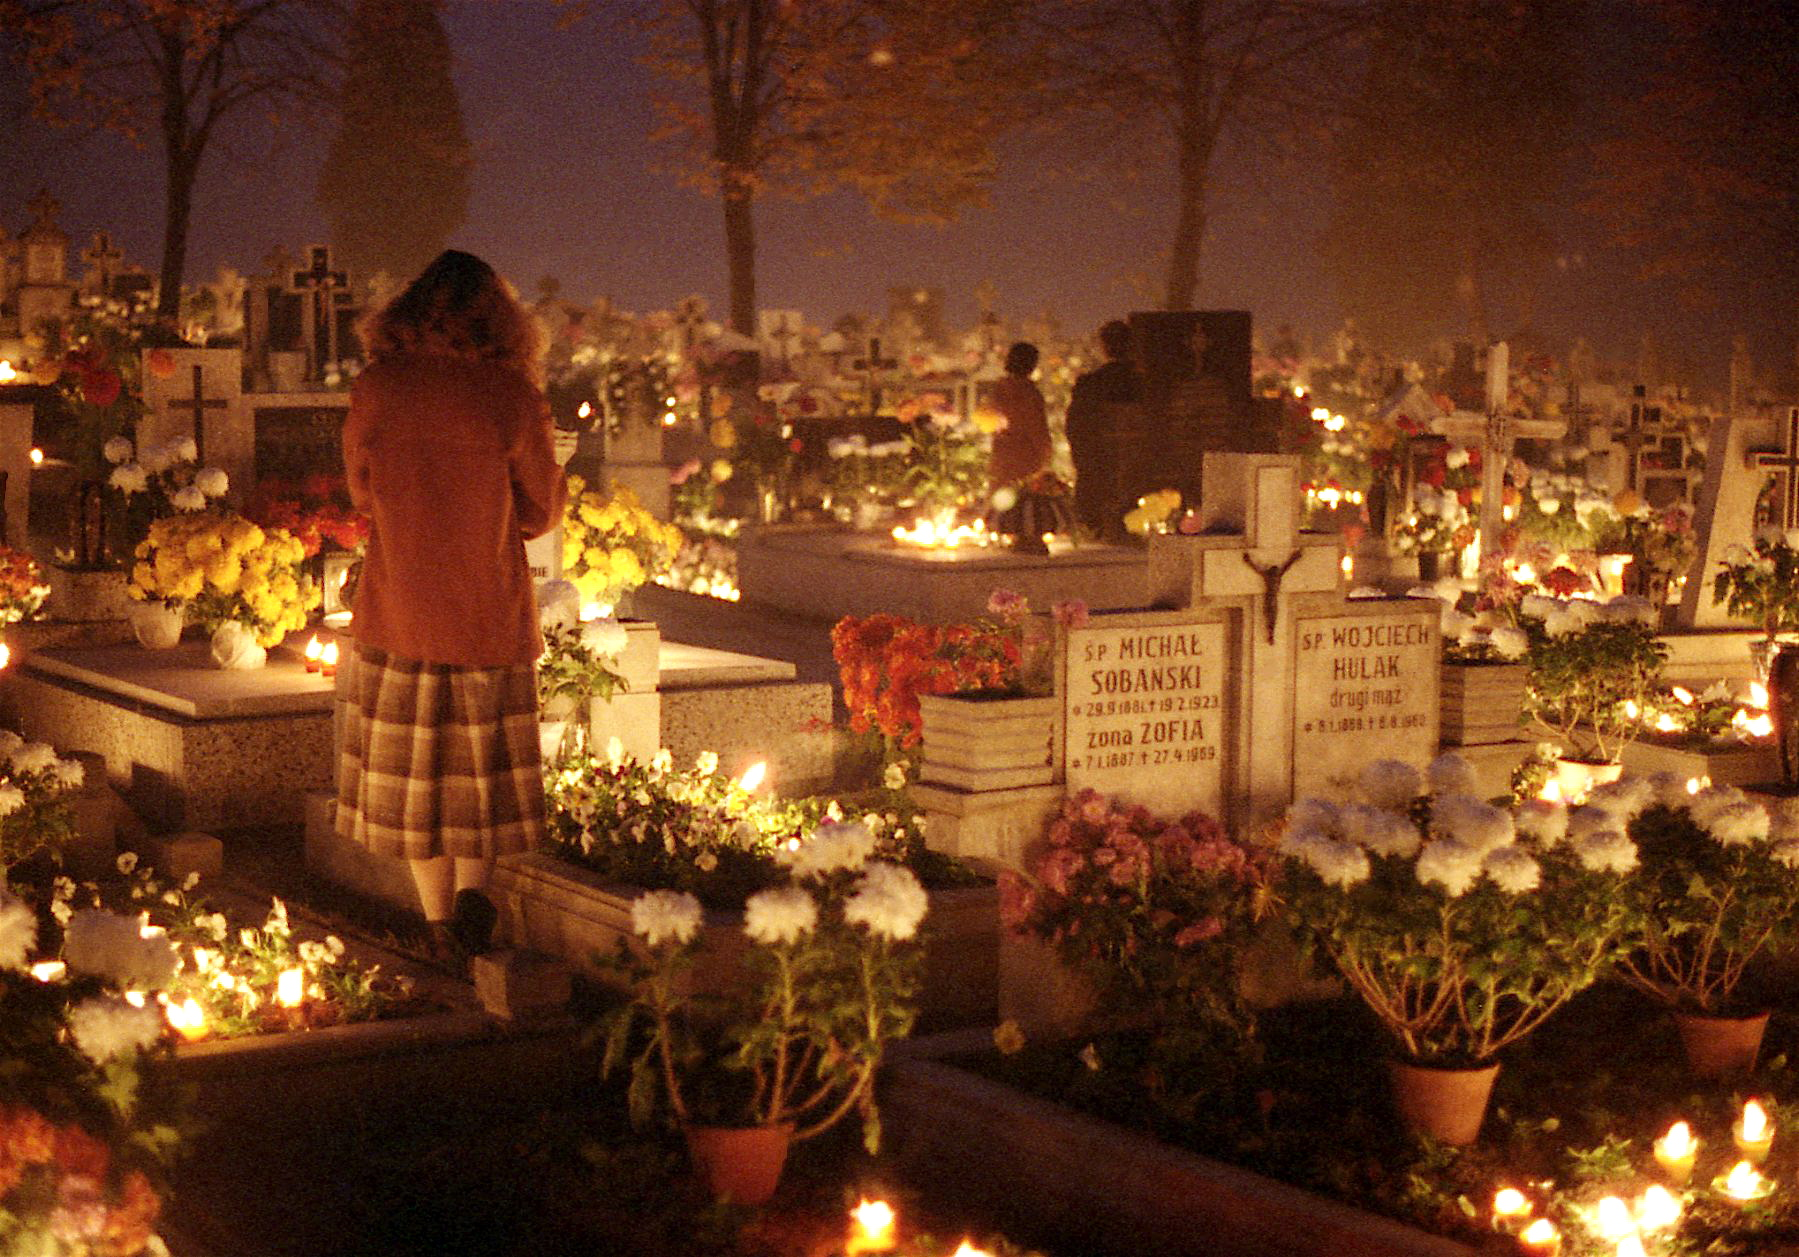 http://upload.wikimedia.org/wikipedia/commons/a/a2/All_Saints_Day,_1984,_Oswiecim,_Poland_Img871.jpg